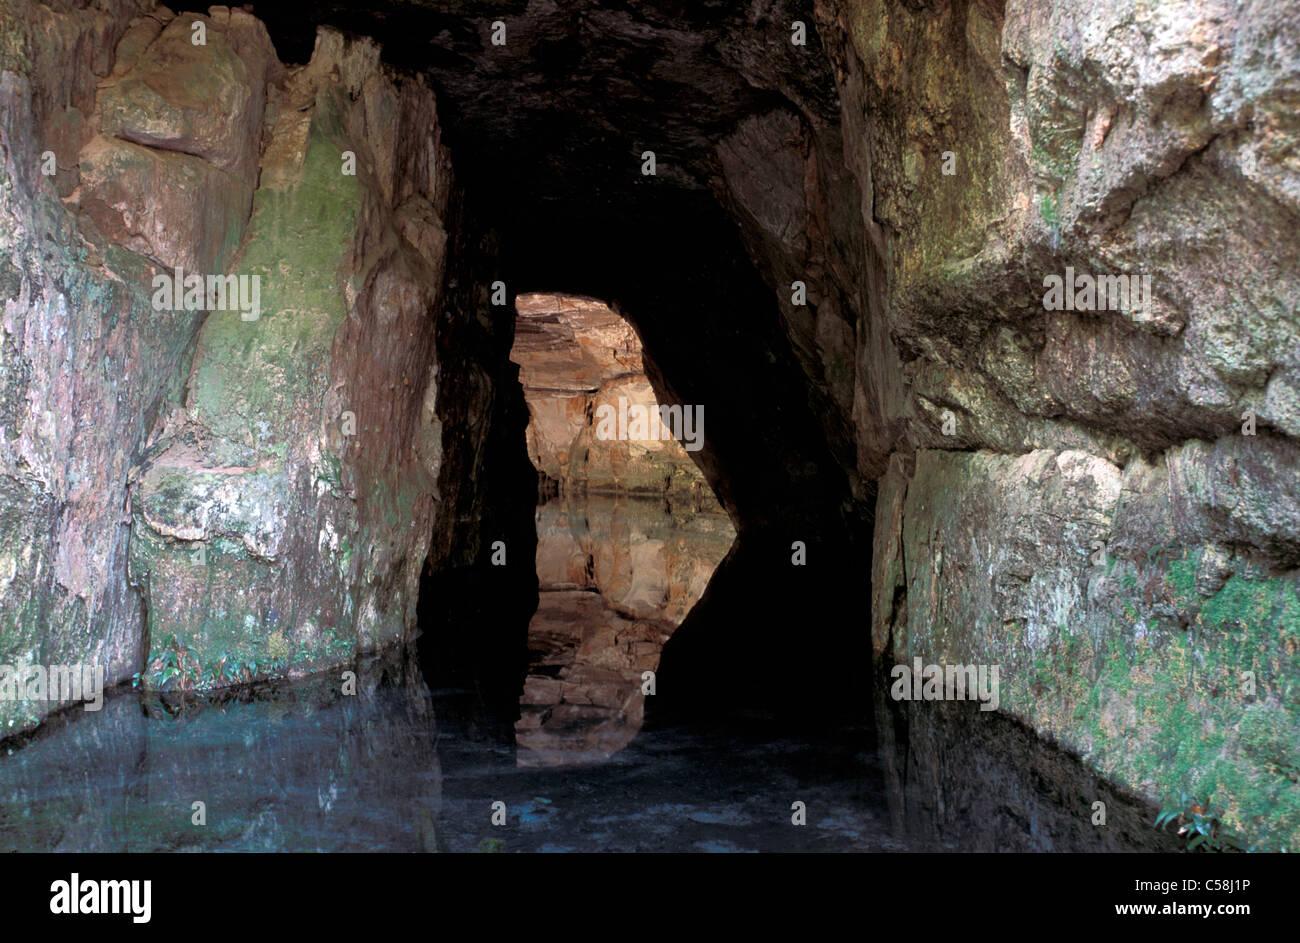 Cavern, Chapada dos Guimares, Mato Grosso, Brazil, South America, cave, water - Stock Image